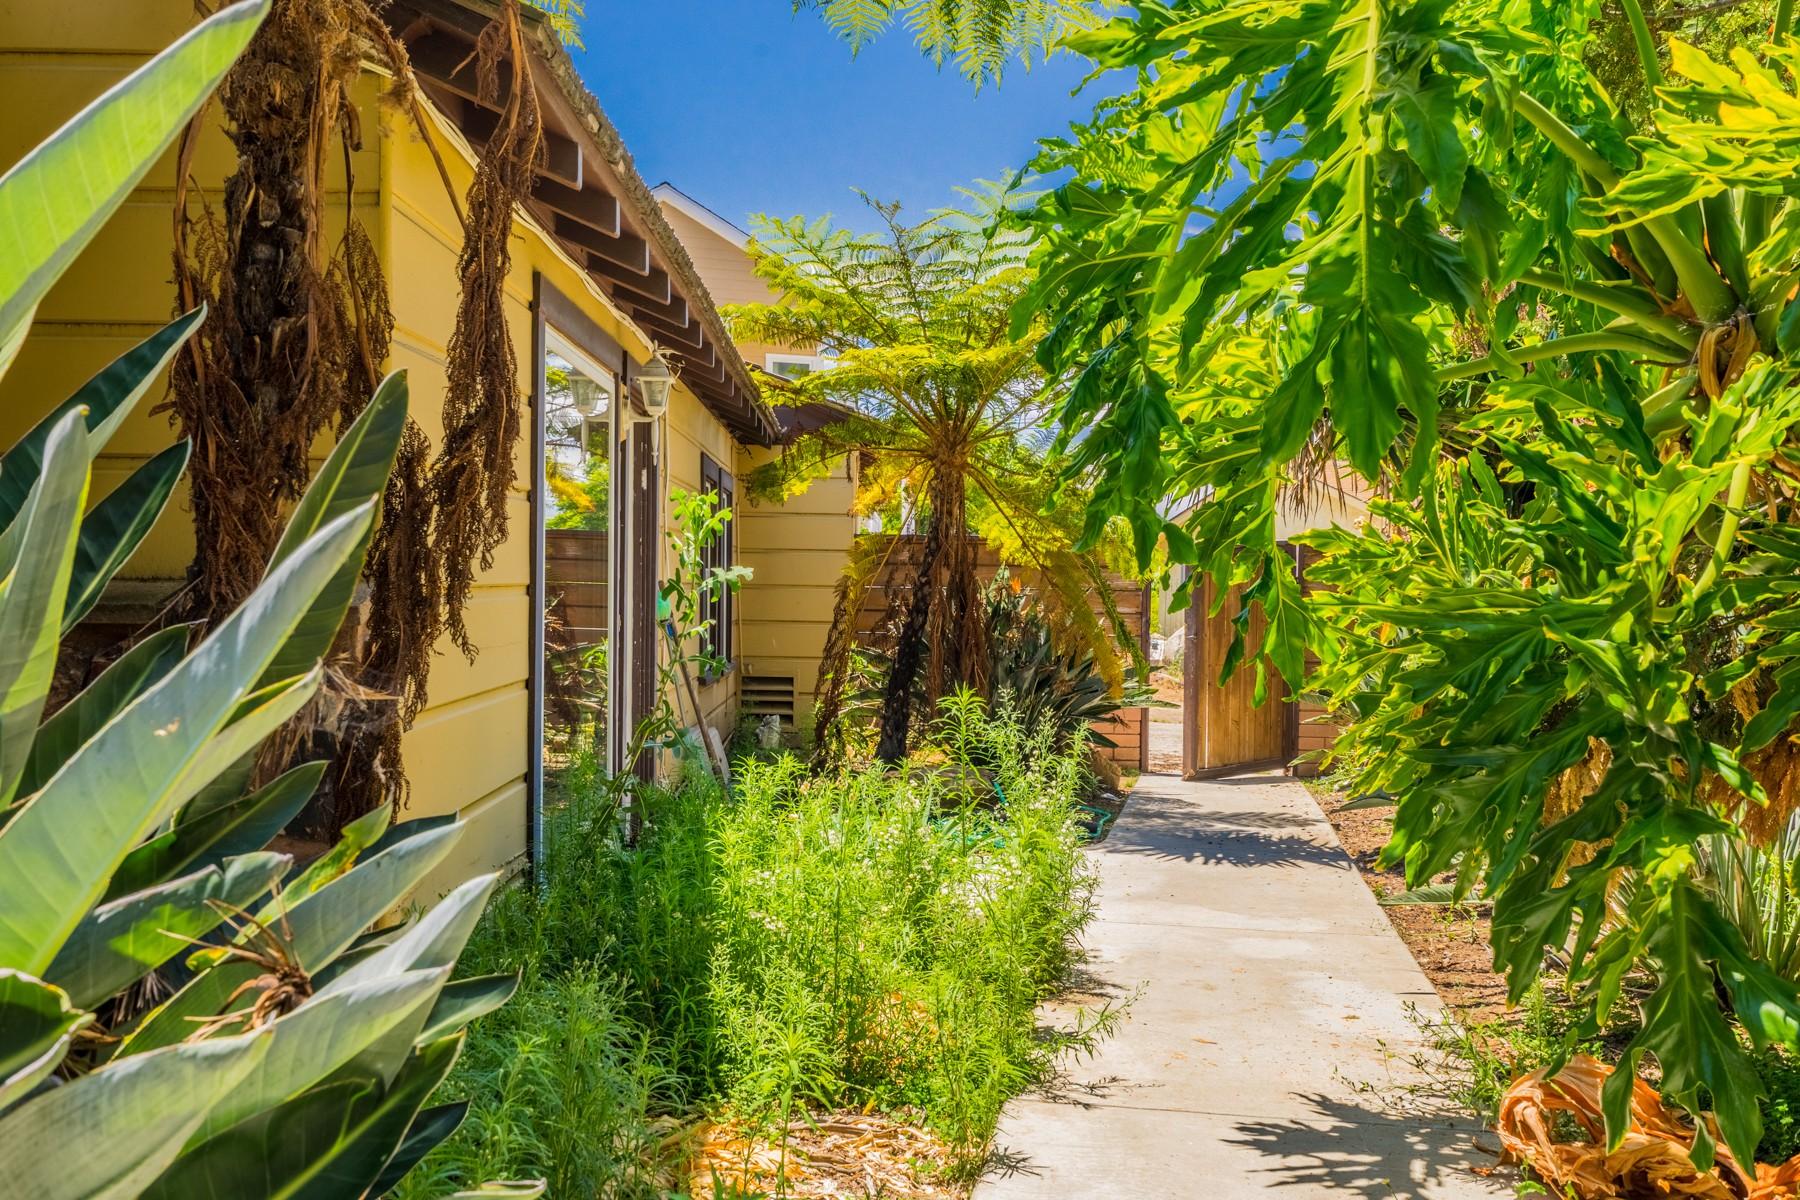 Single Family Home for Sale at 4487 Panorama Drive La Mesa, California, 91941 United States